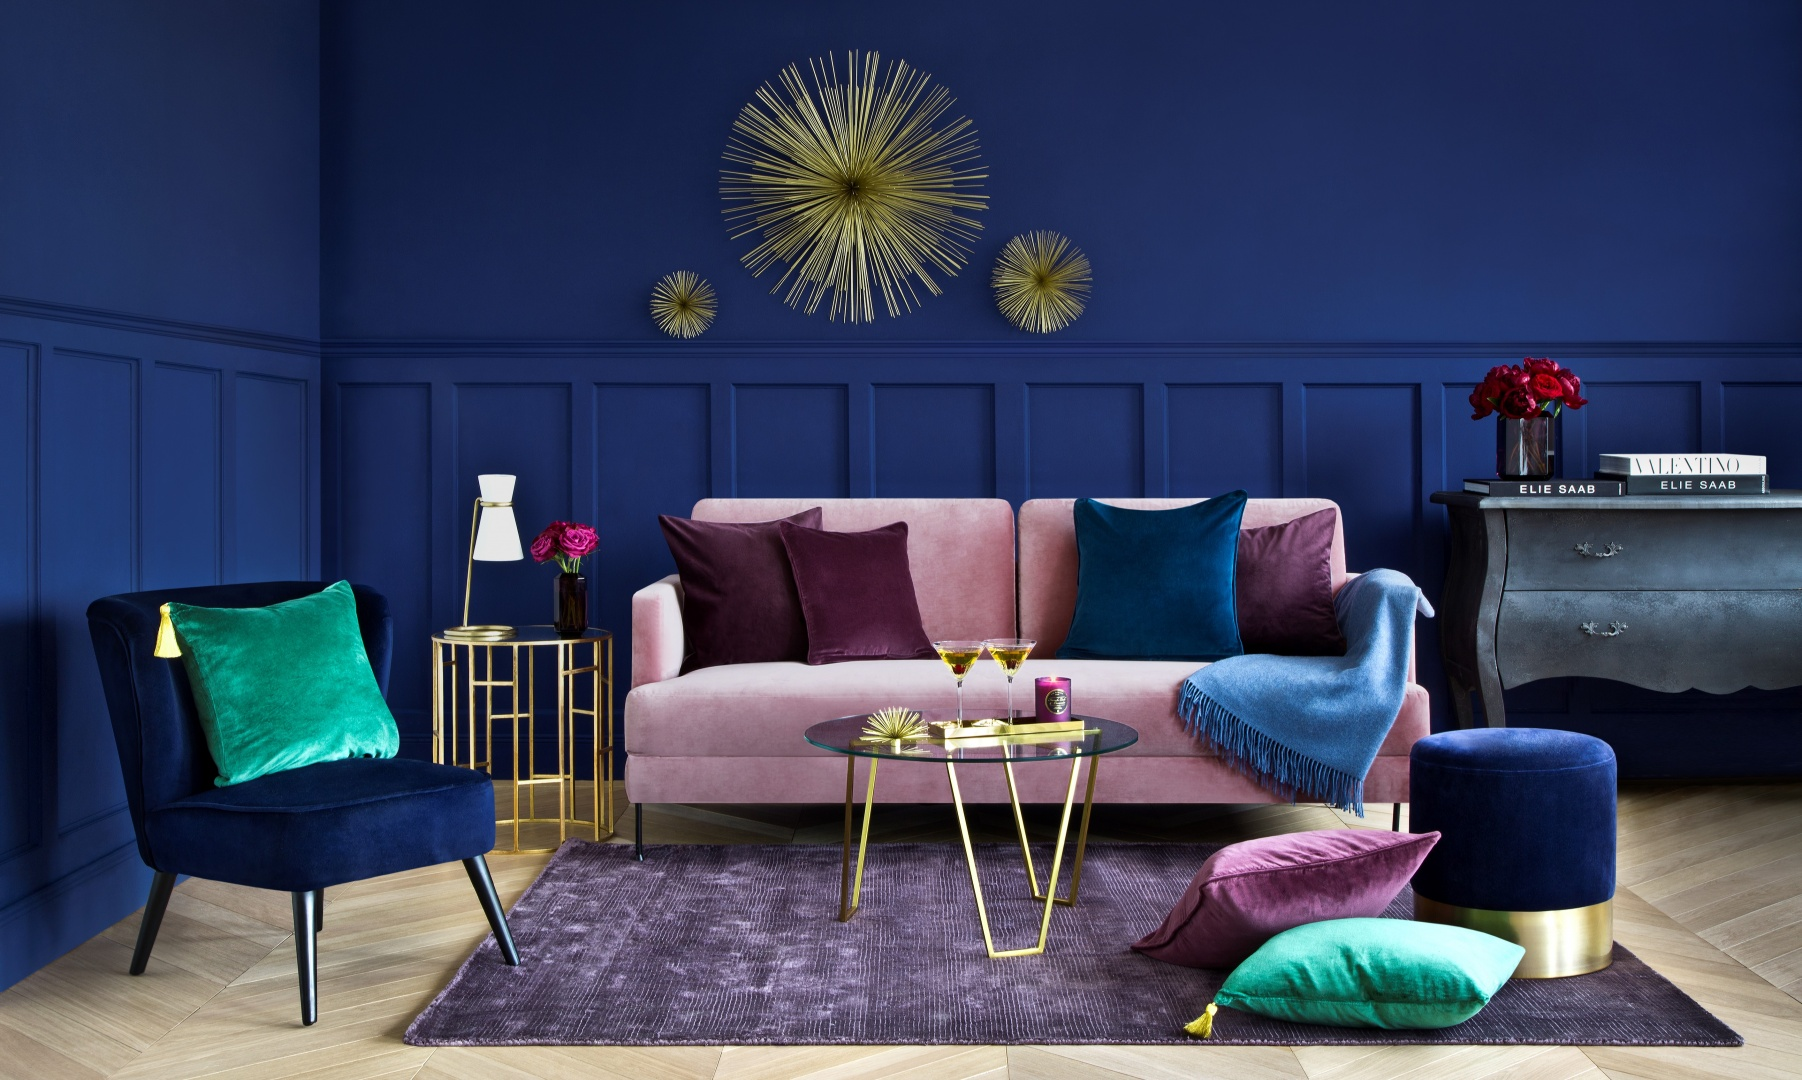 voll im Trend, Stühle, Sessel, Hocker, Sofa aus Samt